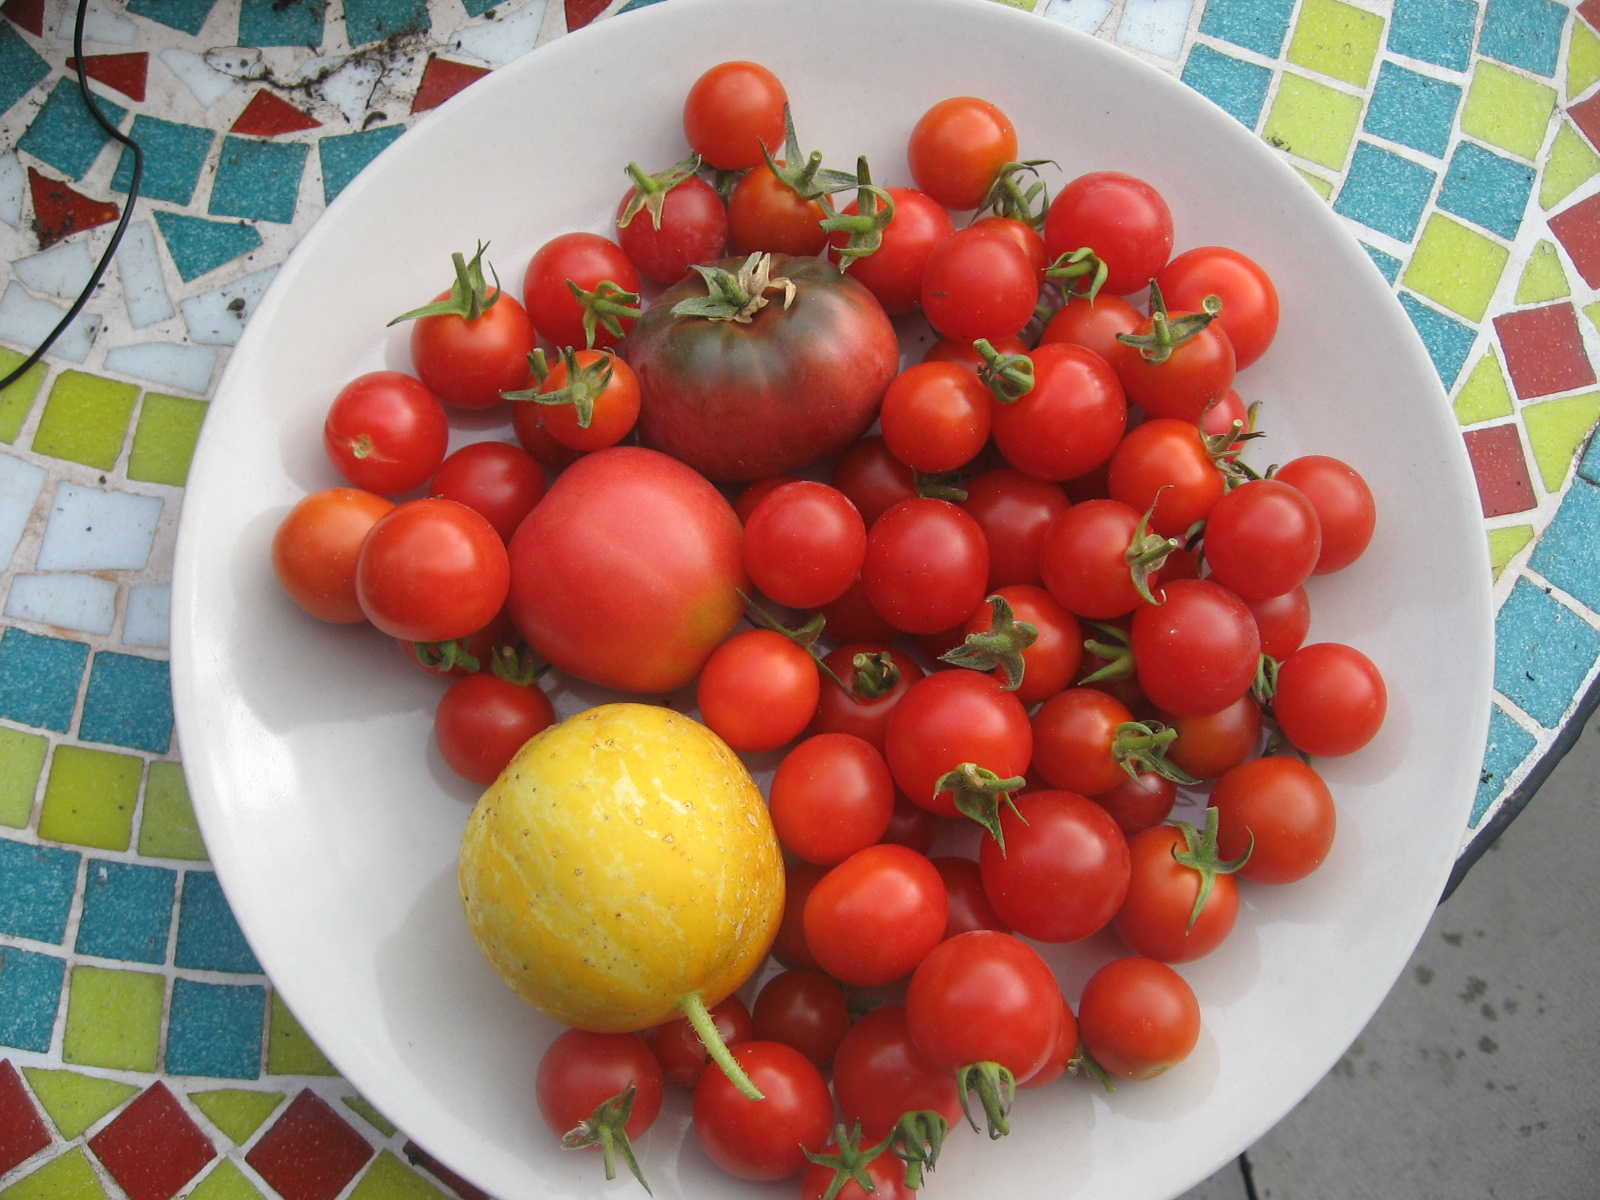 Bolton Urban Growers series – Community Food Growing